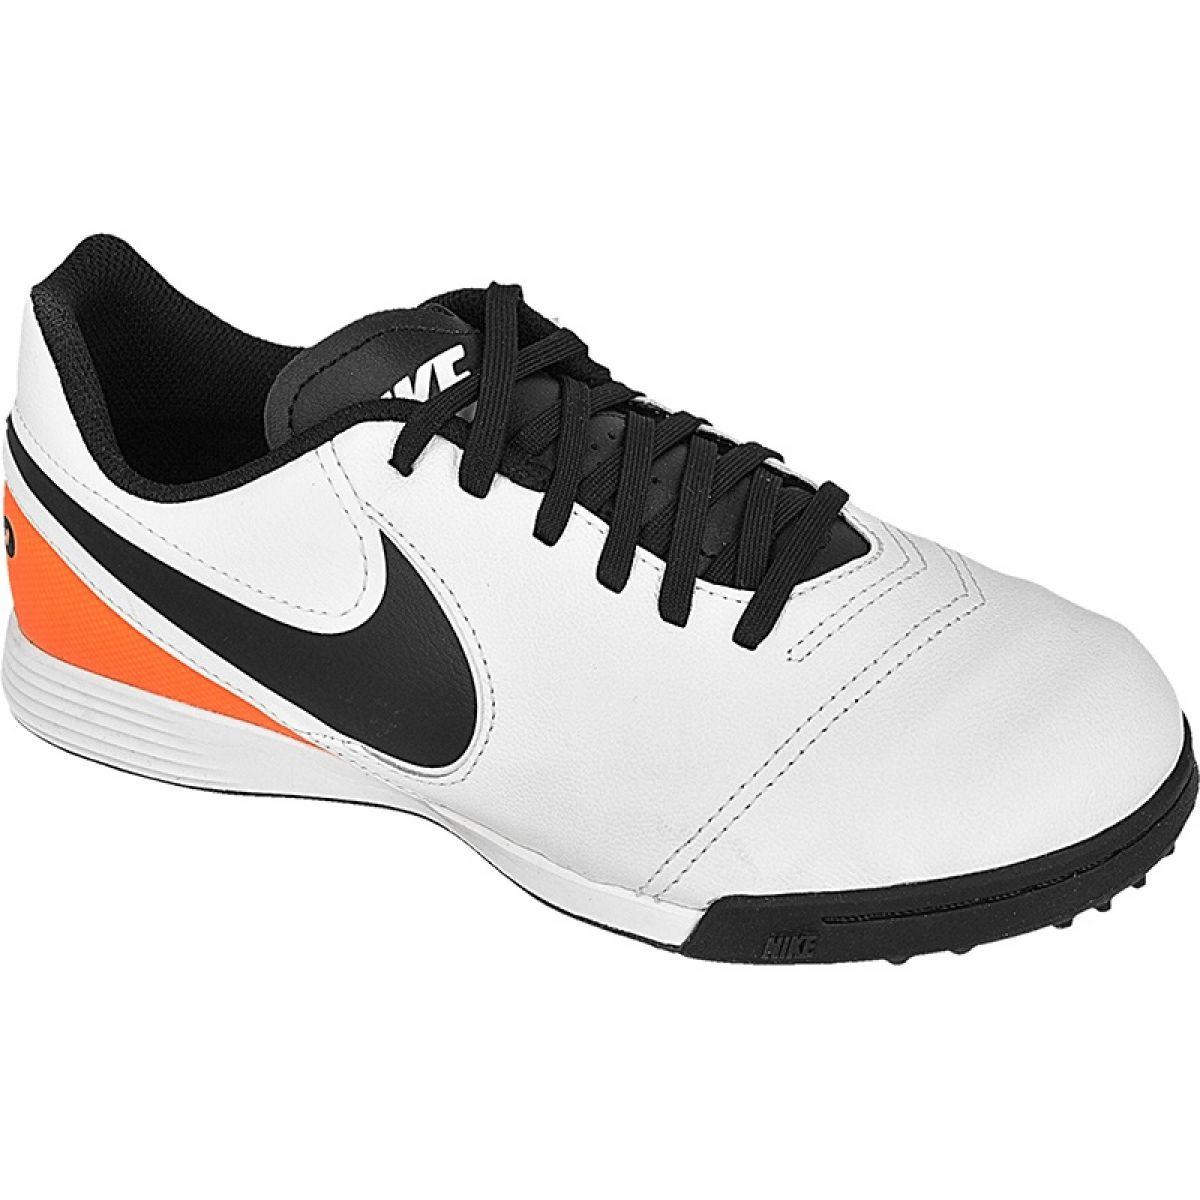 separation shoes c8f62 64b14 Football boots Nike Tiempo Legend Vi Tf Jr 819191-108